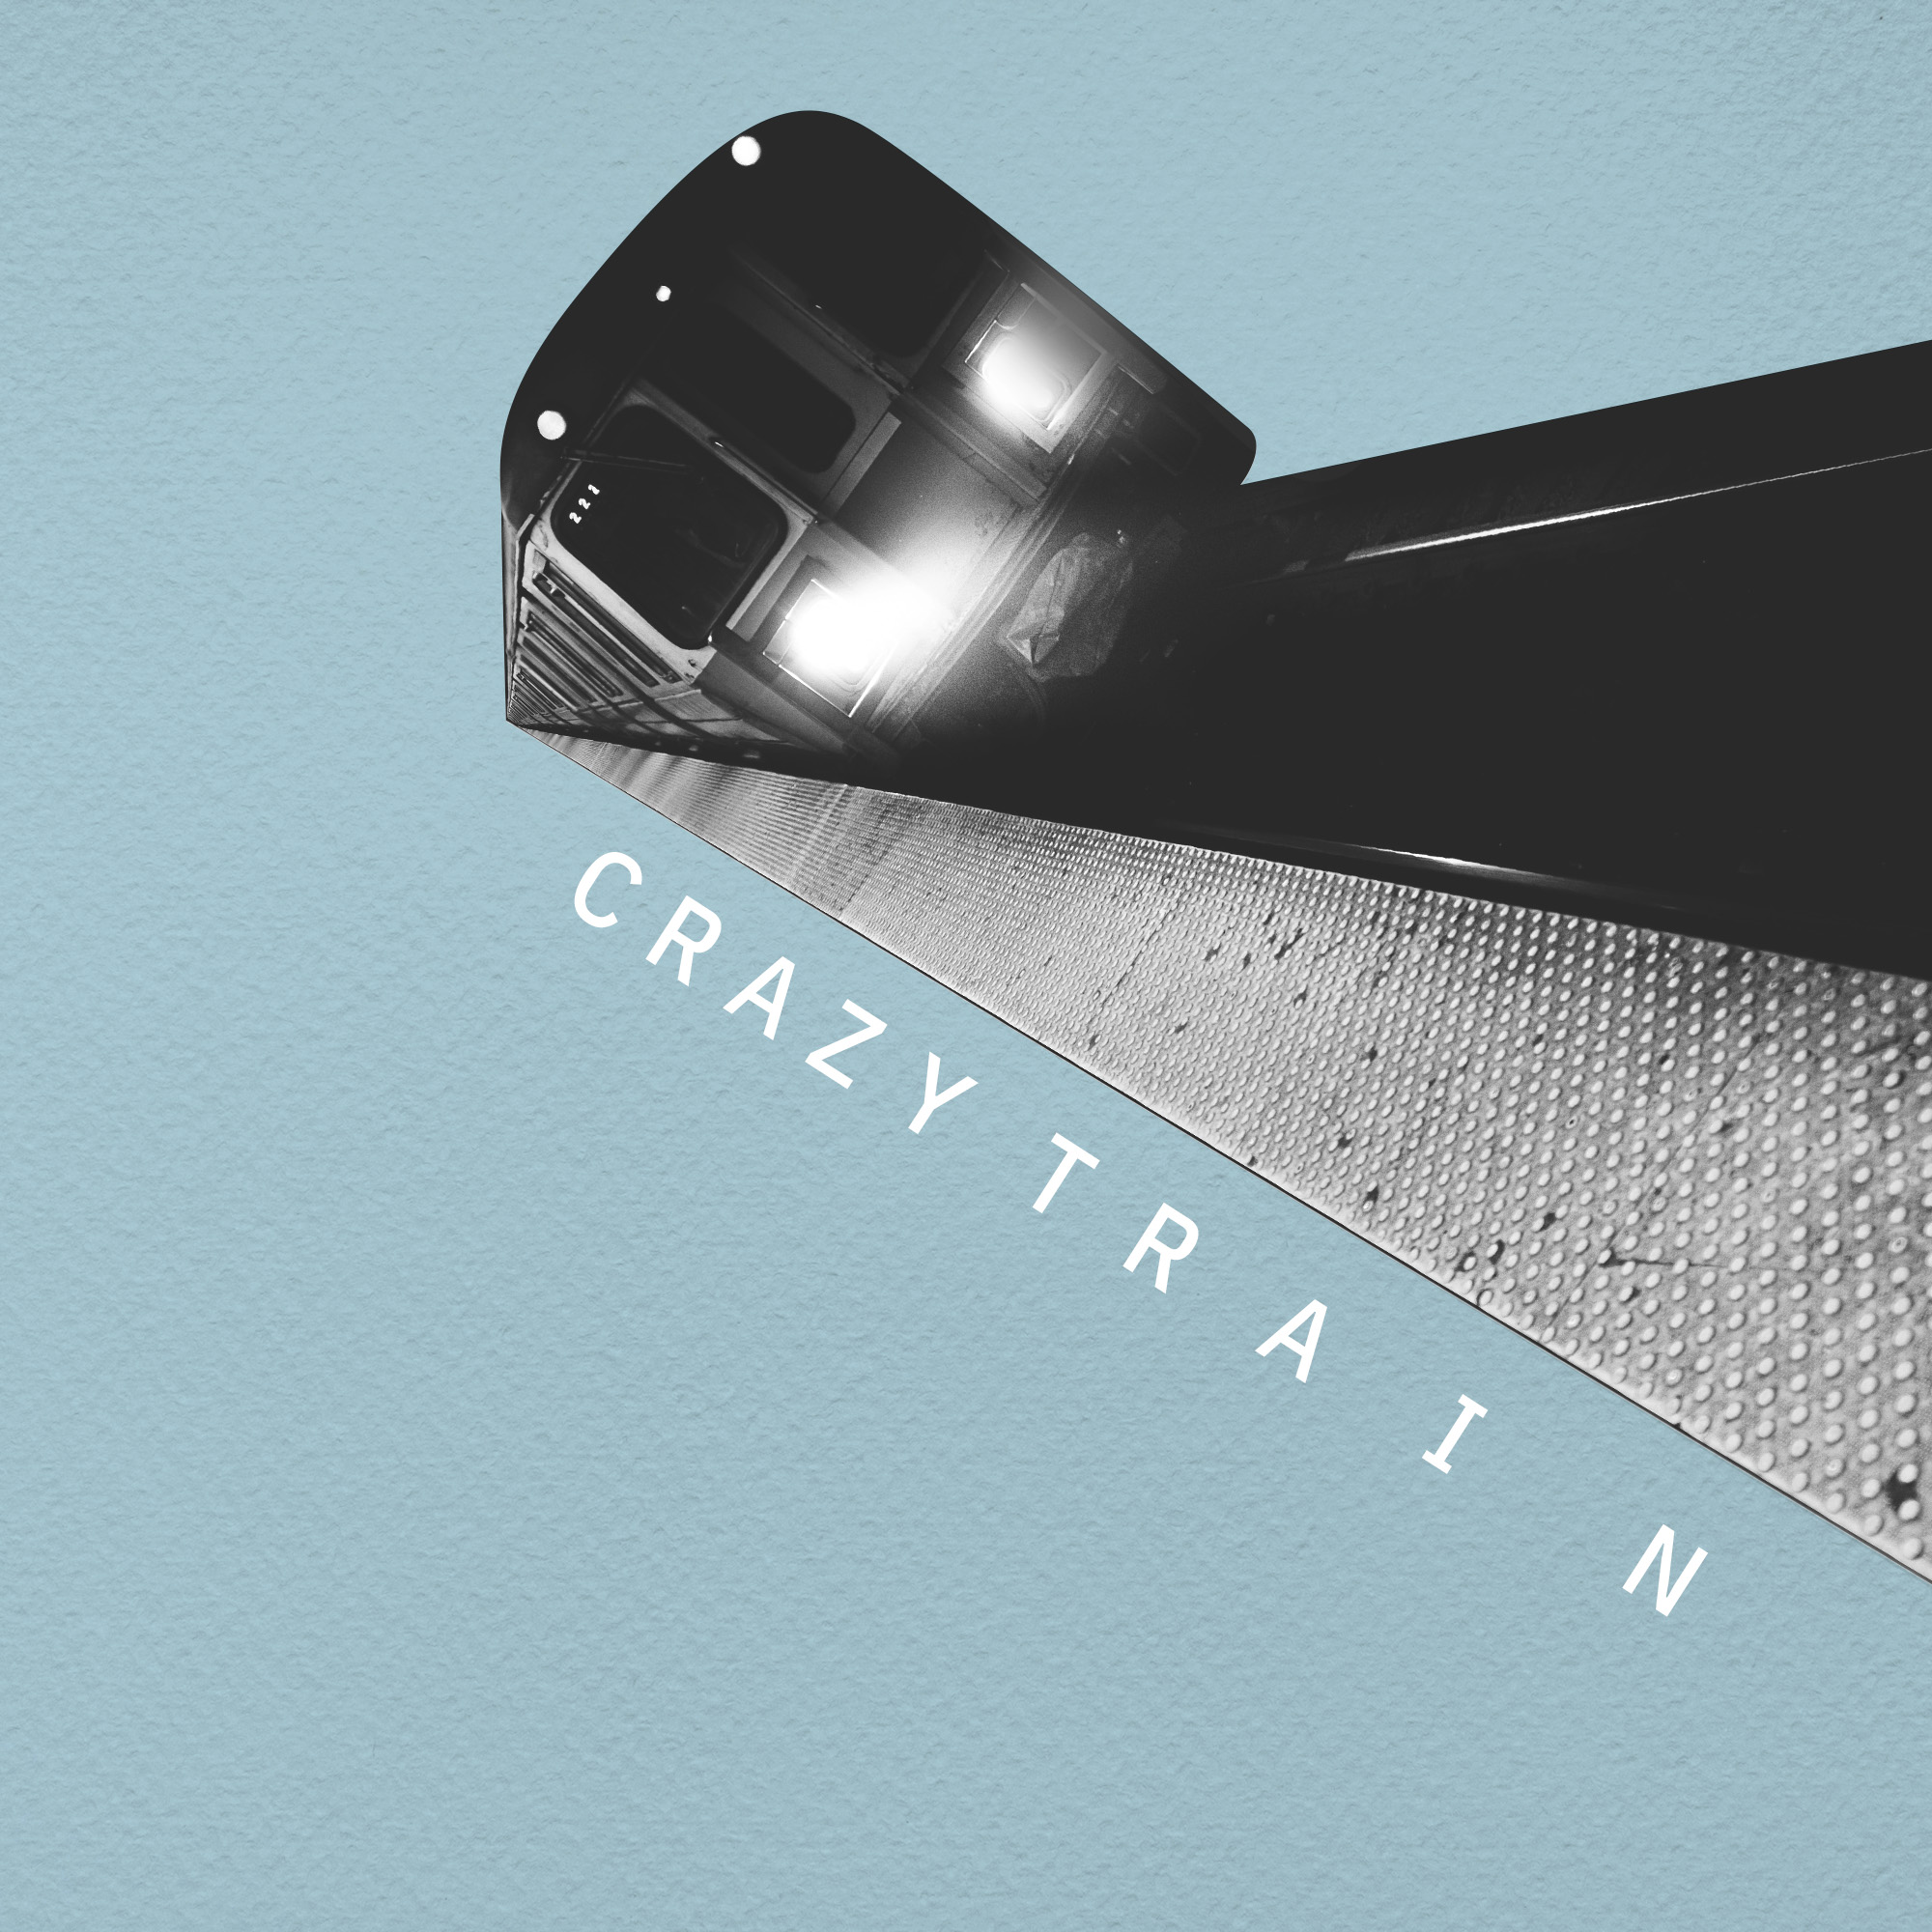 Crazy Train cover - Craig Haller